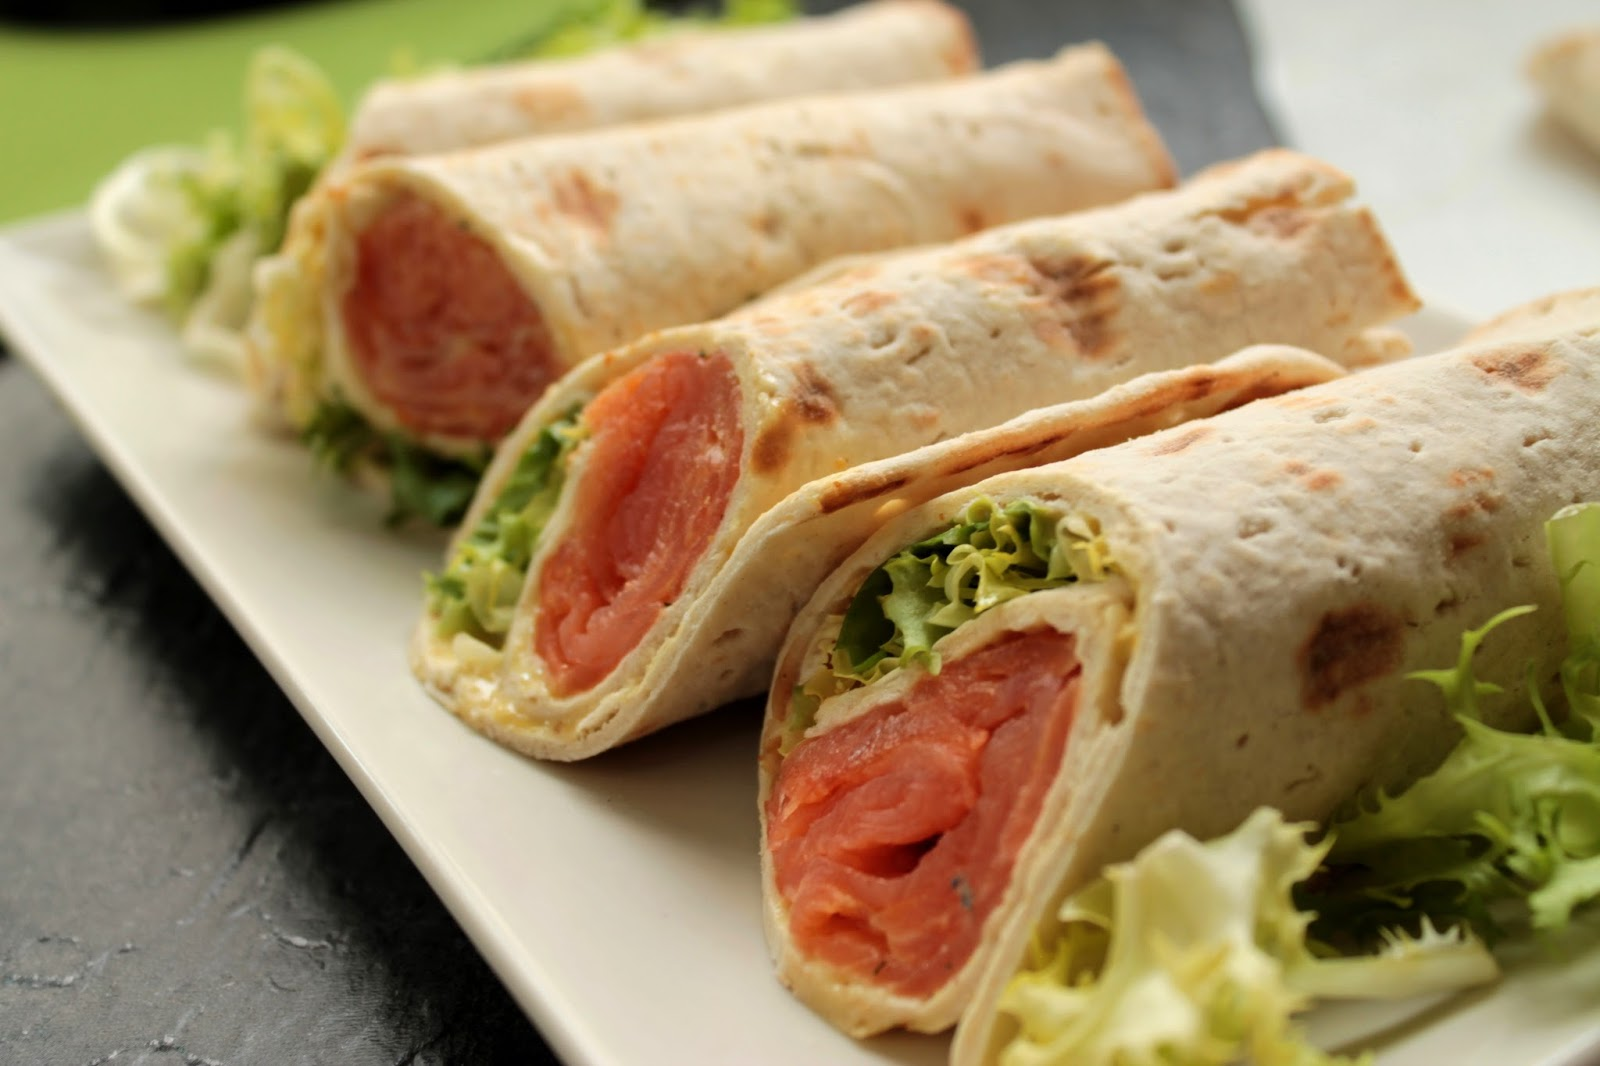 Rollitos de salmón (IKEA) Salmon rolls